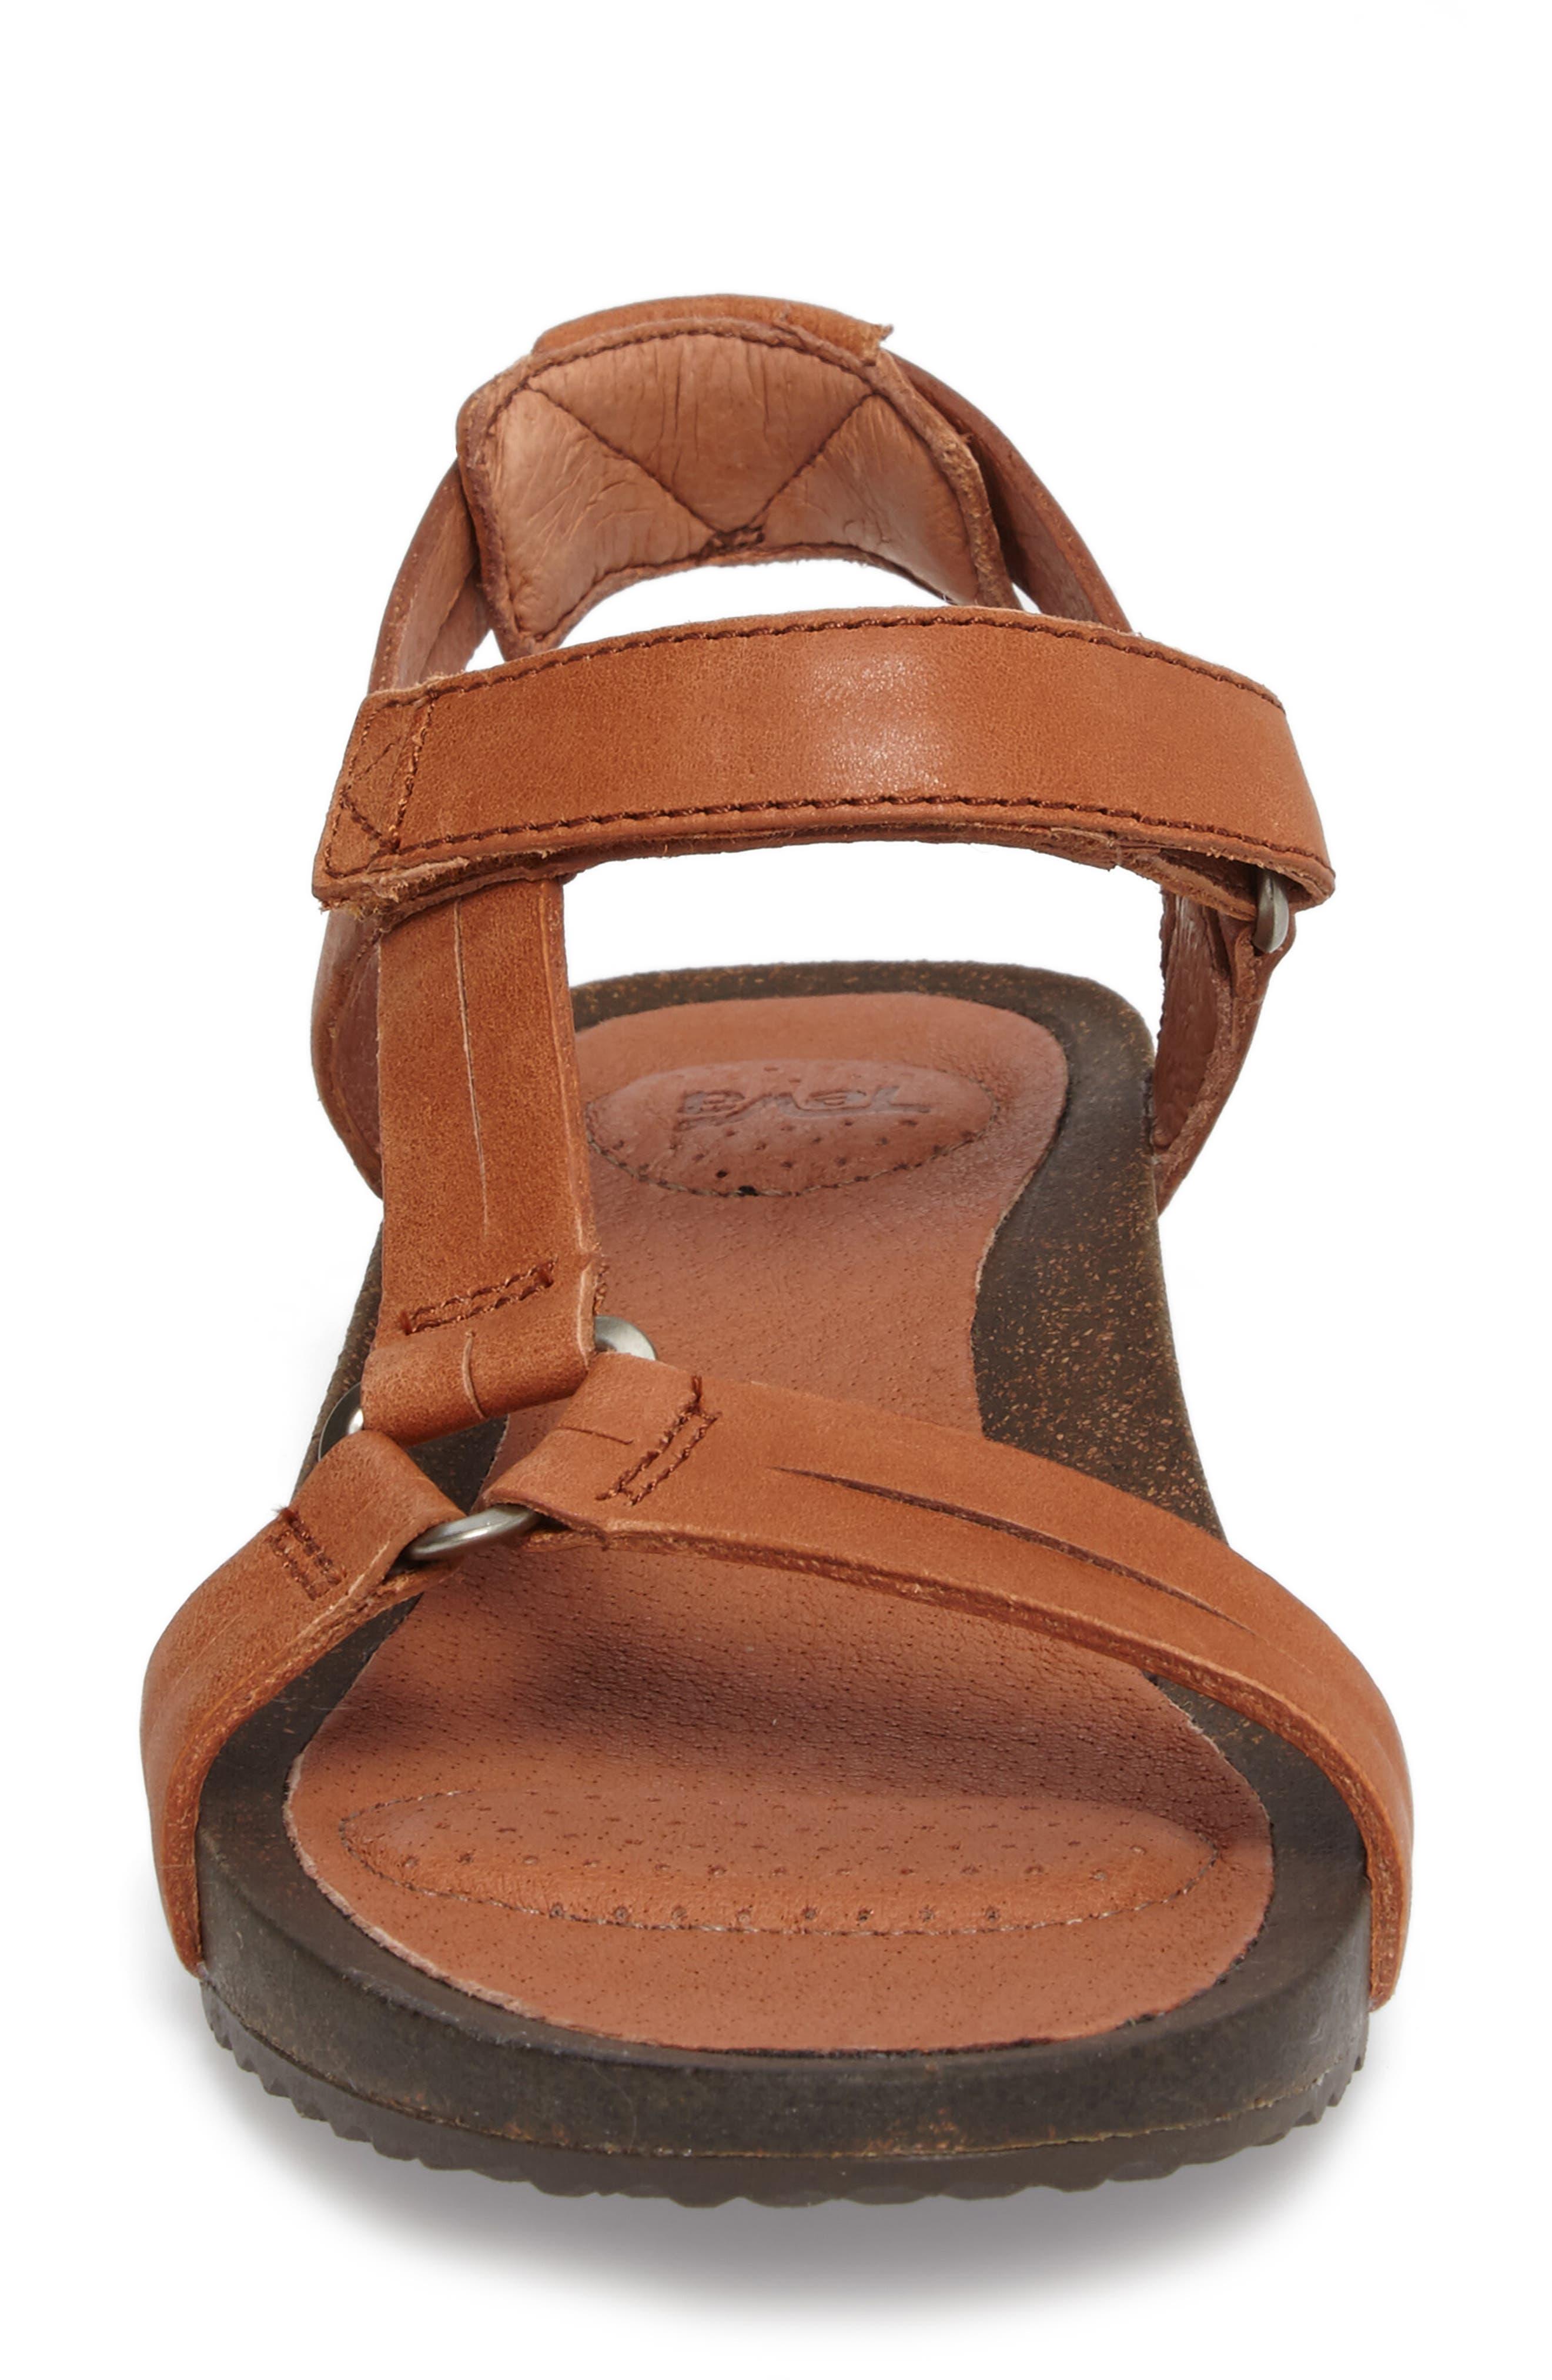 Ysidro Universal Sandal,                             Alternate thumbnail 5, color,                             Cognac Leather